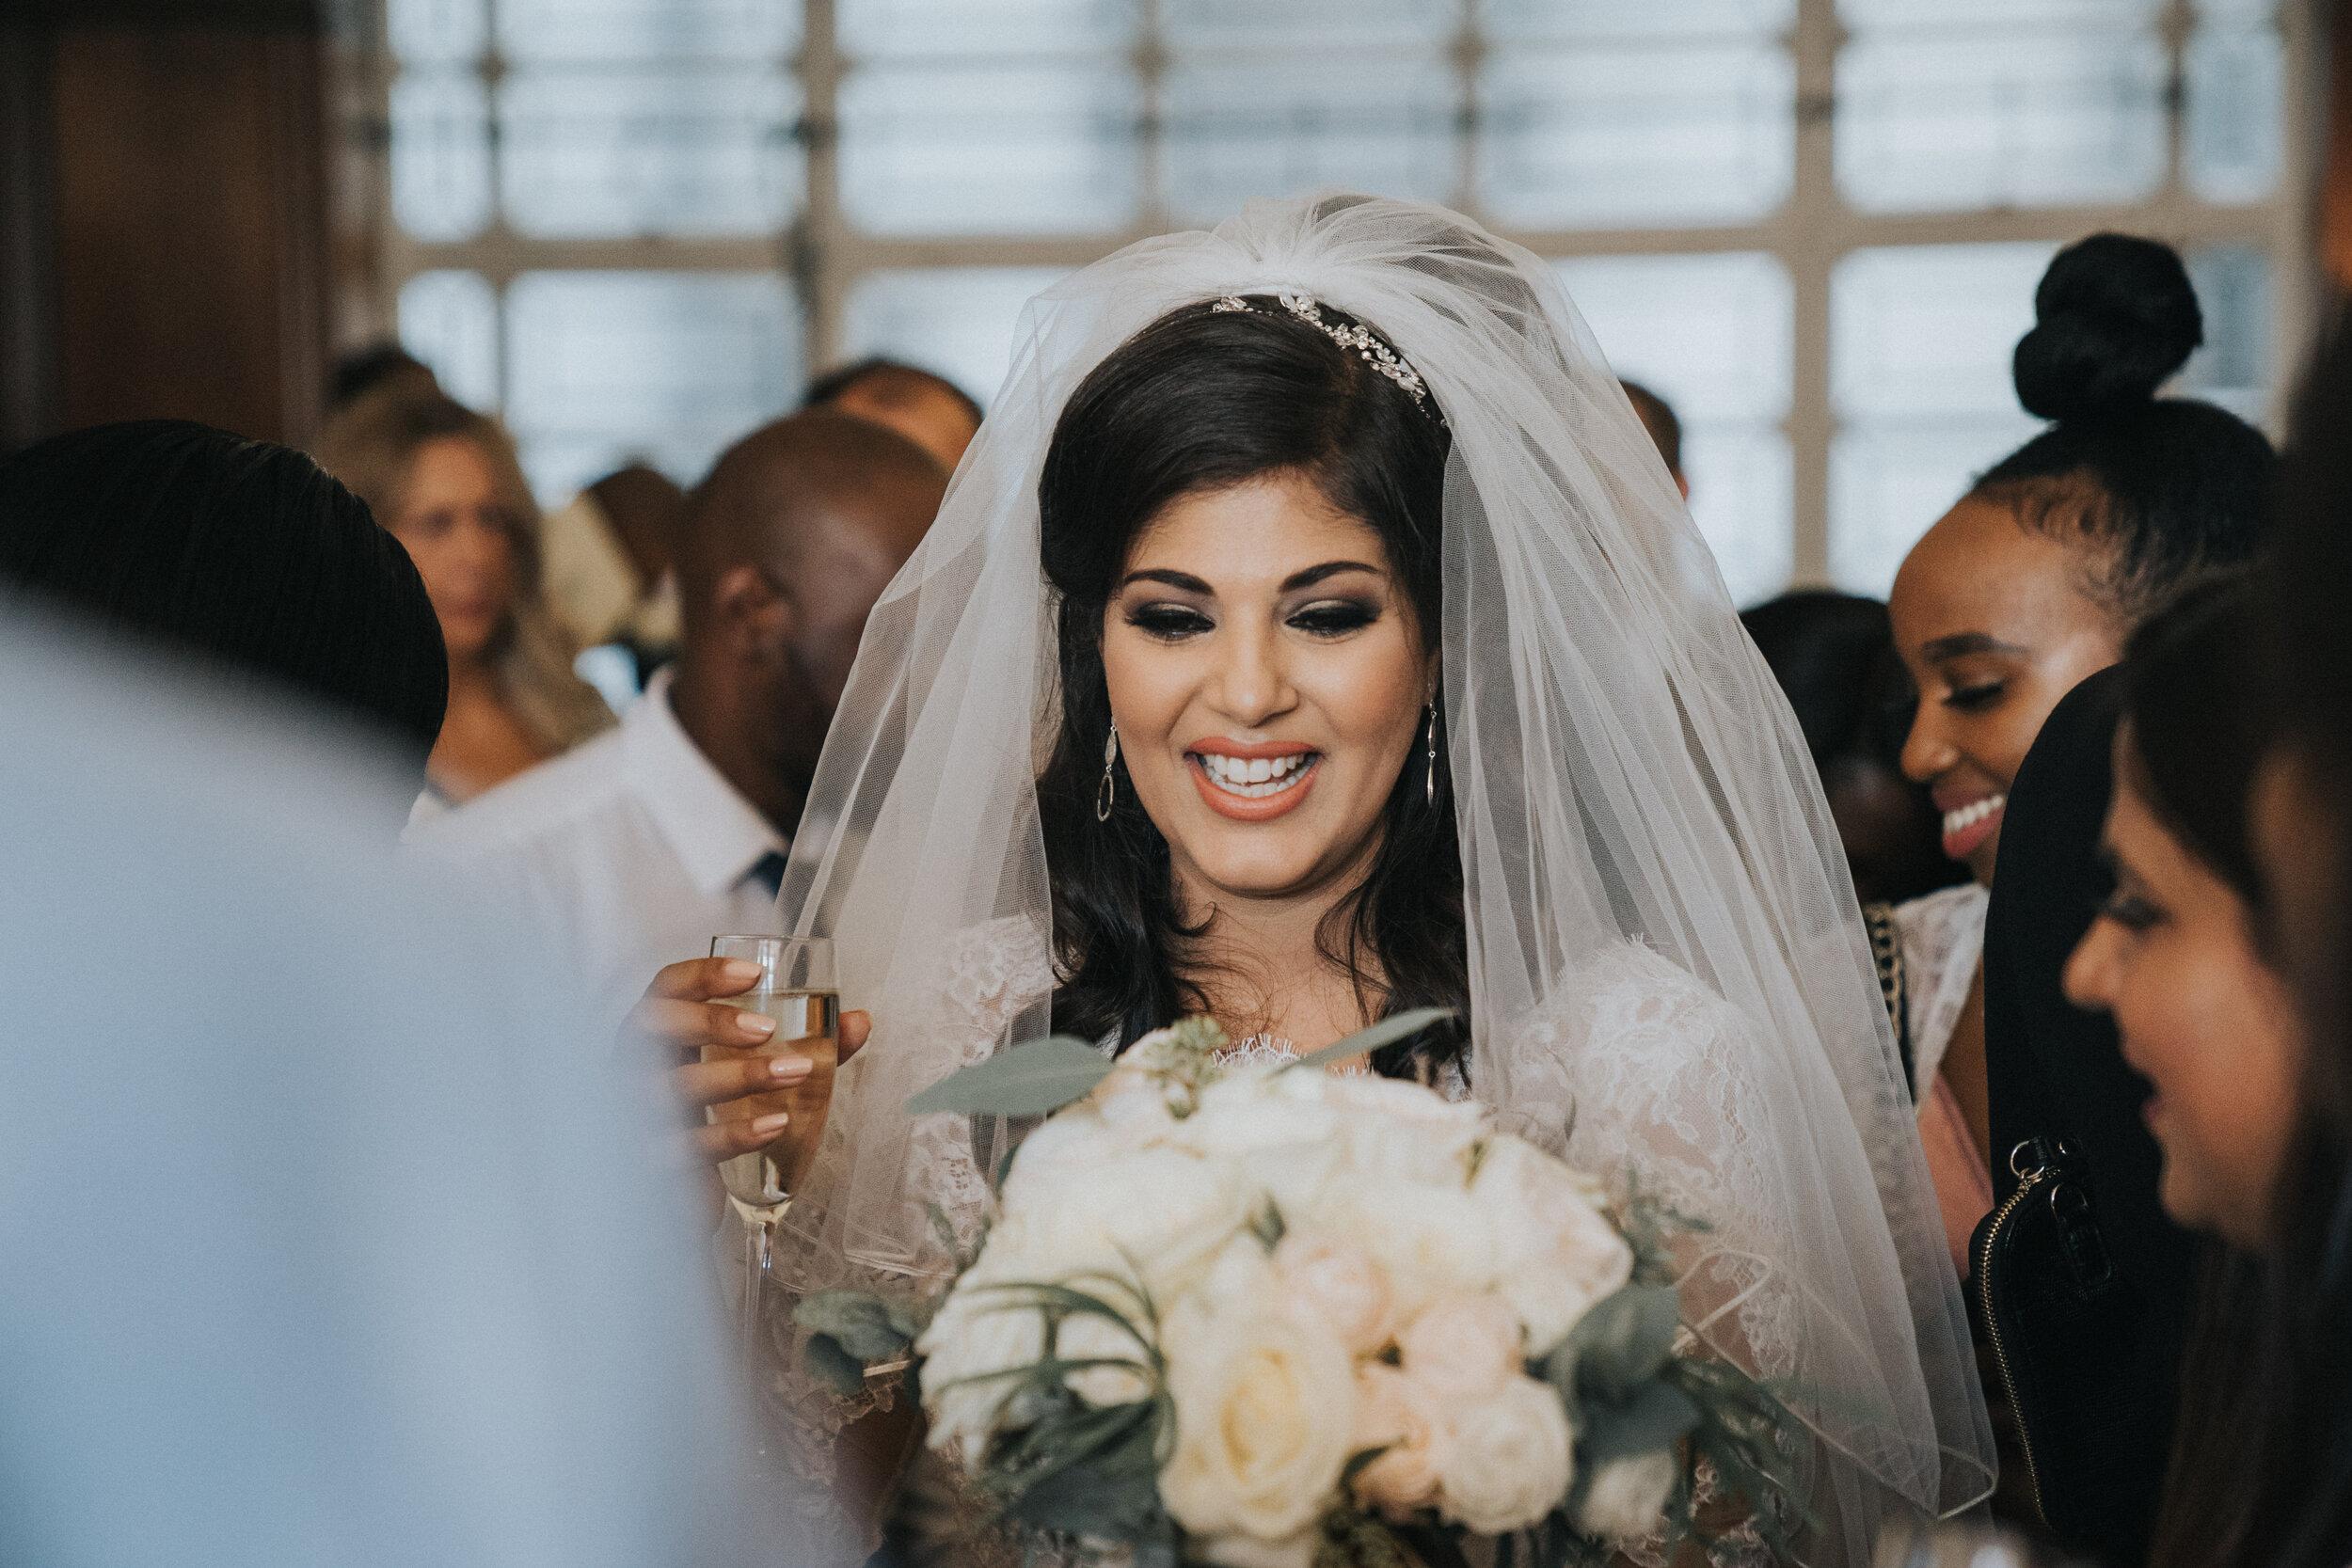 east-london-wedding-photographer-videographer-patriot-square-apartments-404